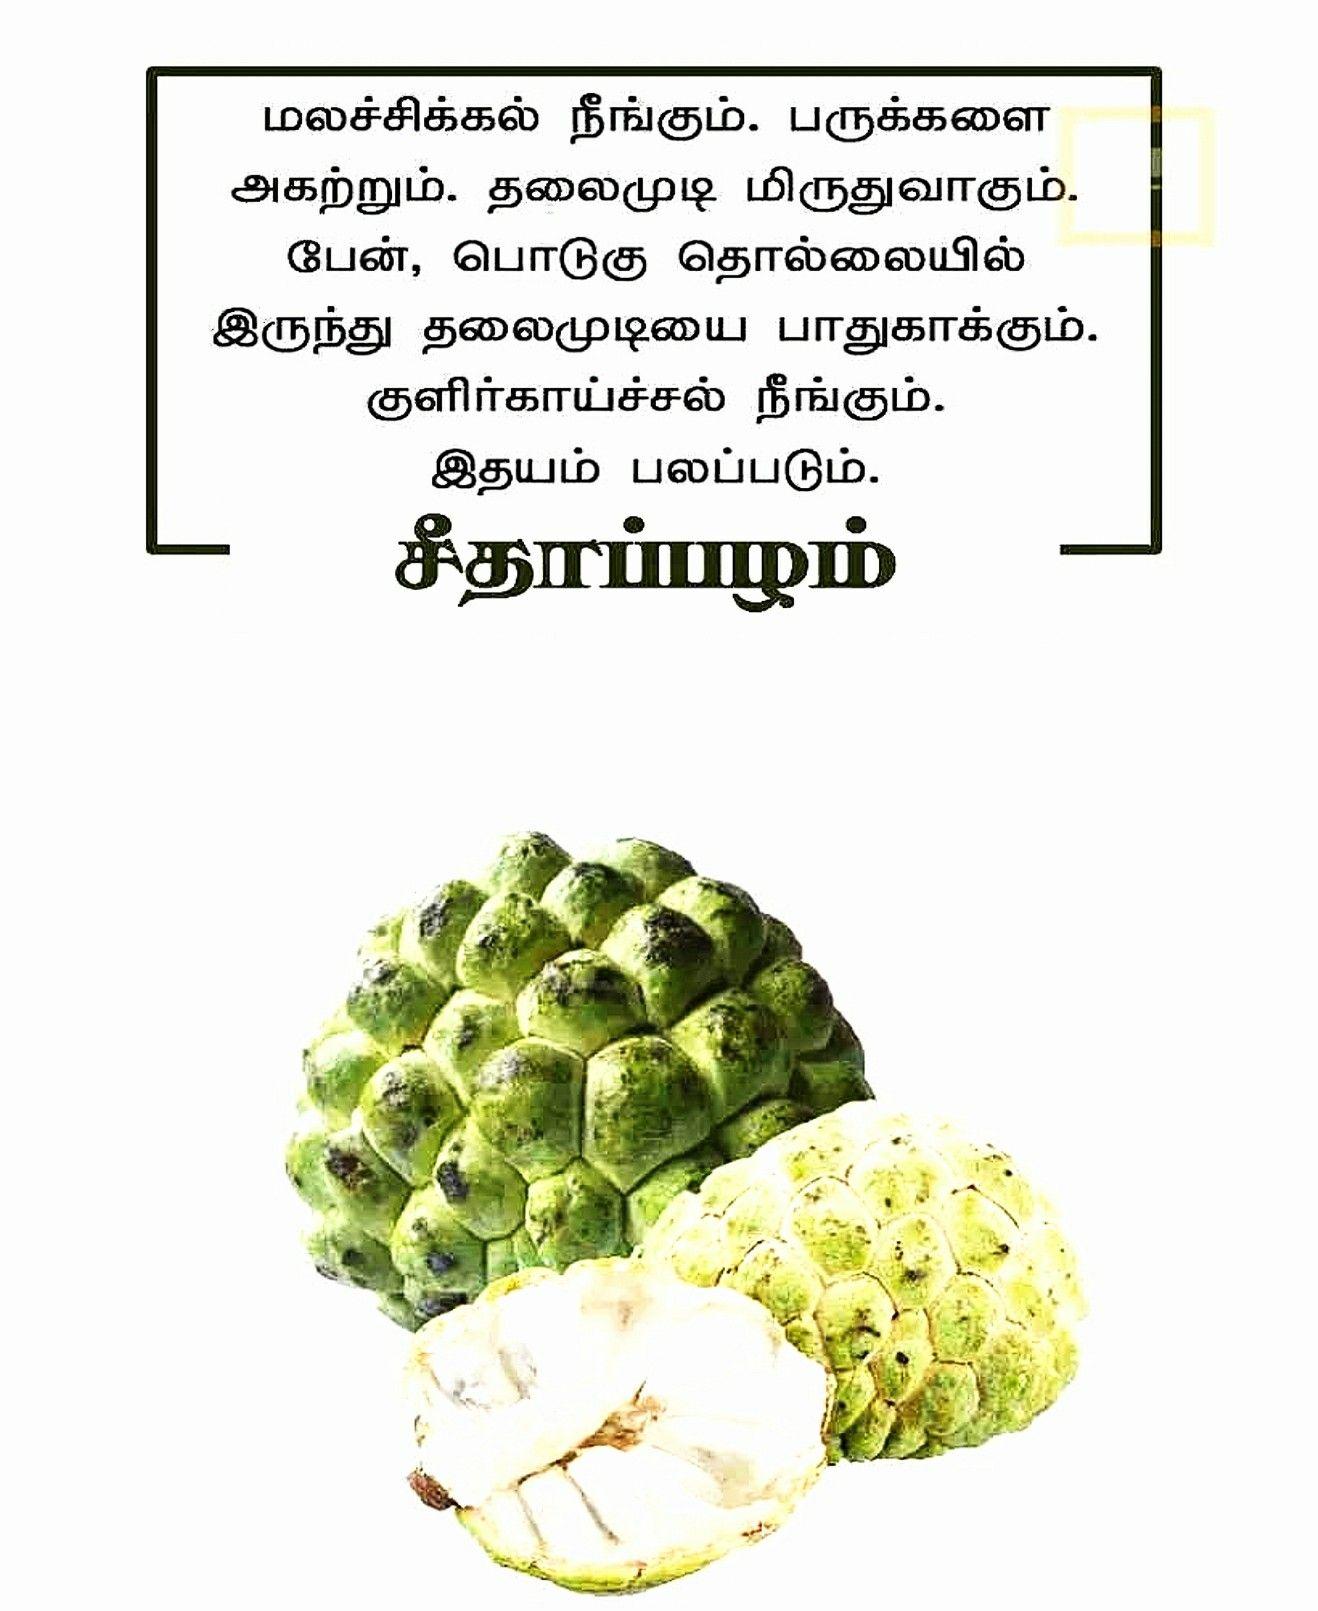 Pin By Karuppaiya On Vasu Chittoor Tamil Fruit Benefits Fruit Health Benefits Guava Benefits